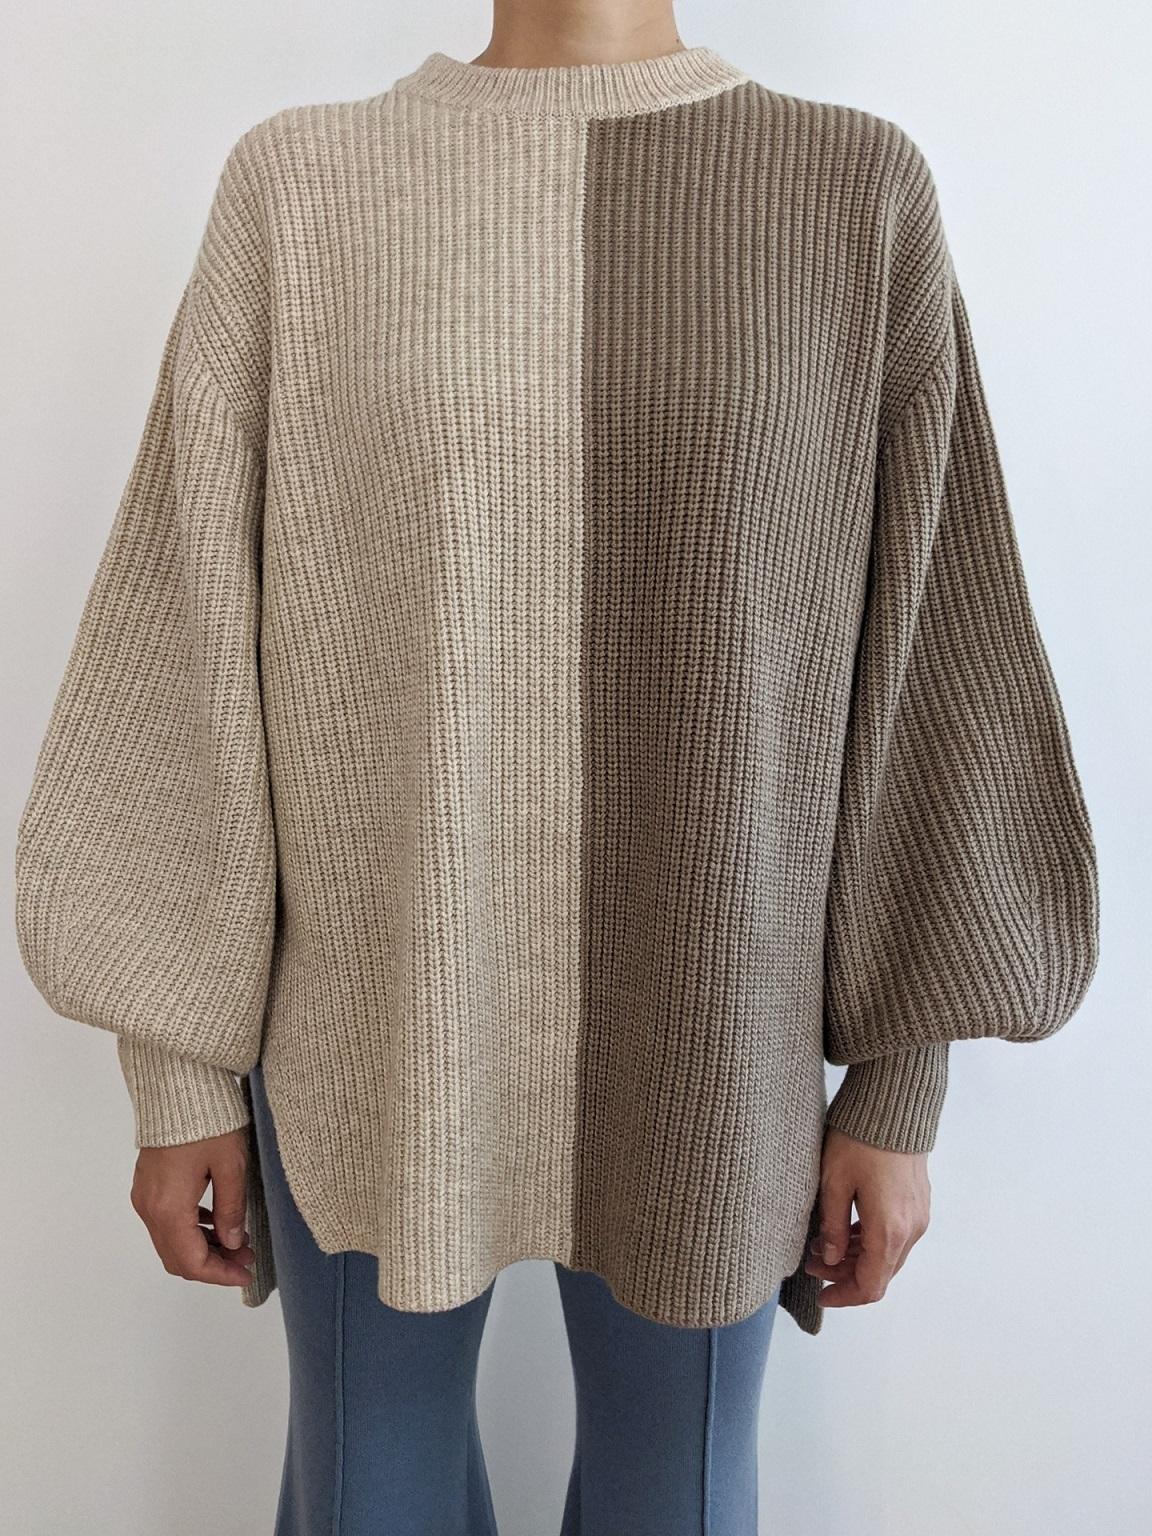 Bicolor Pullover - Sand/Beige